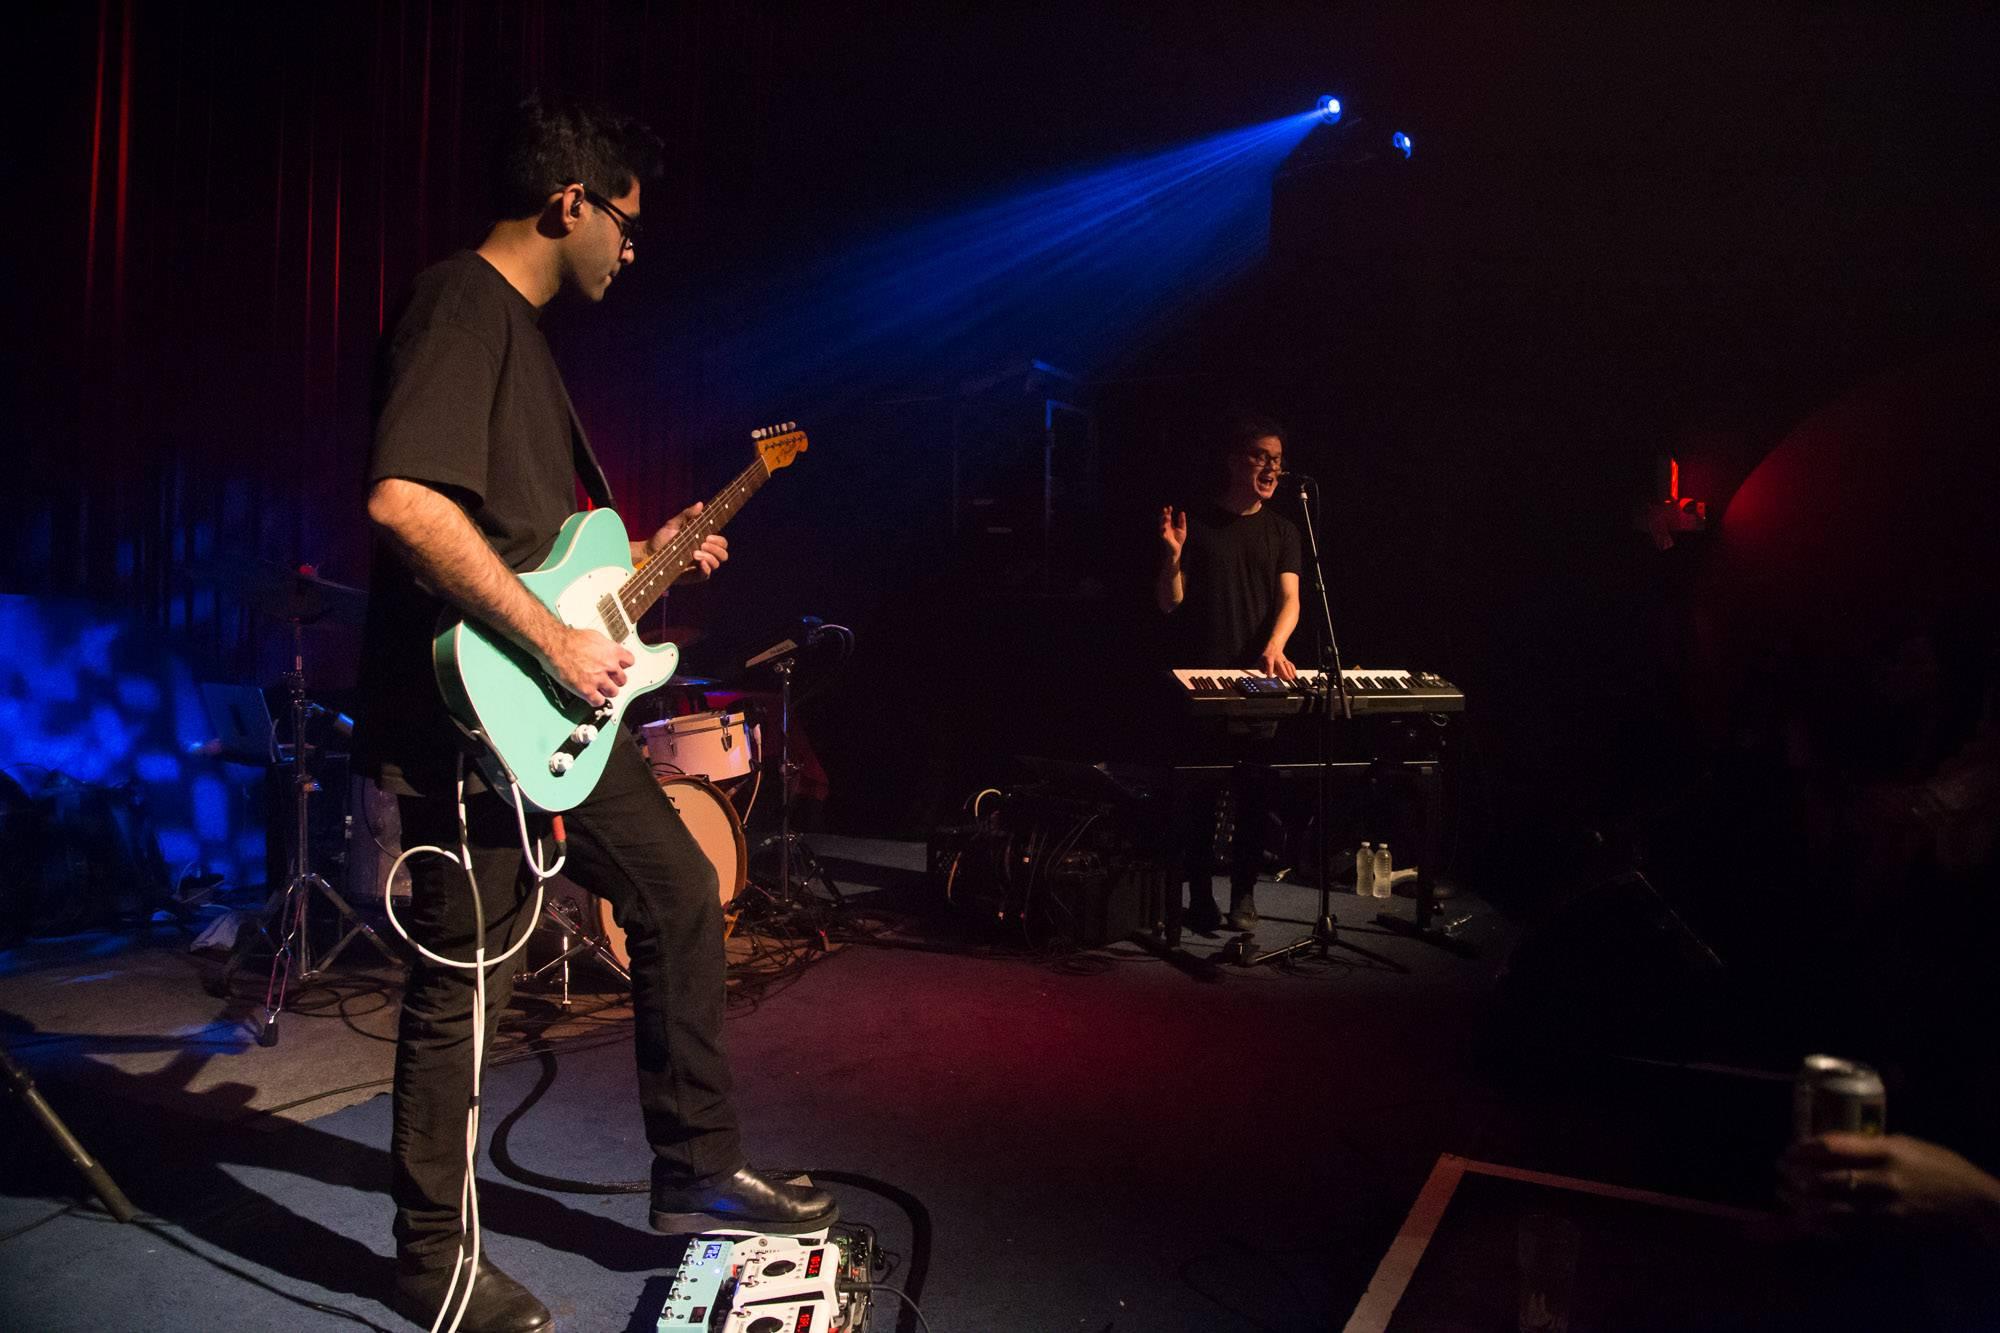 Son Lux at the Fox Cabaret, Vancouver, Mar 14 2018. Kirk Chantraine photo.